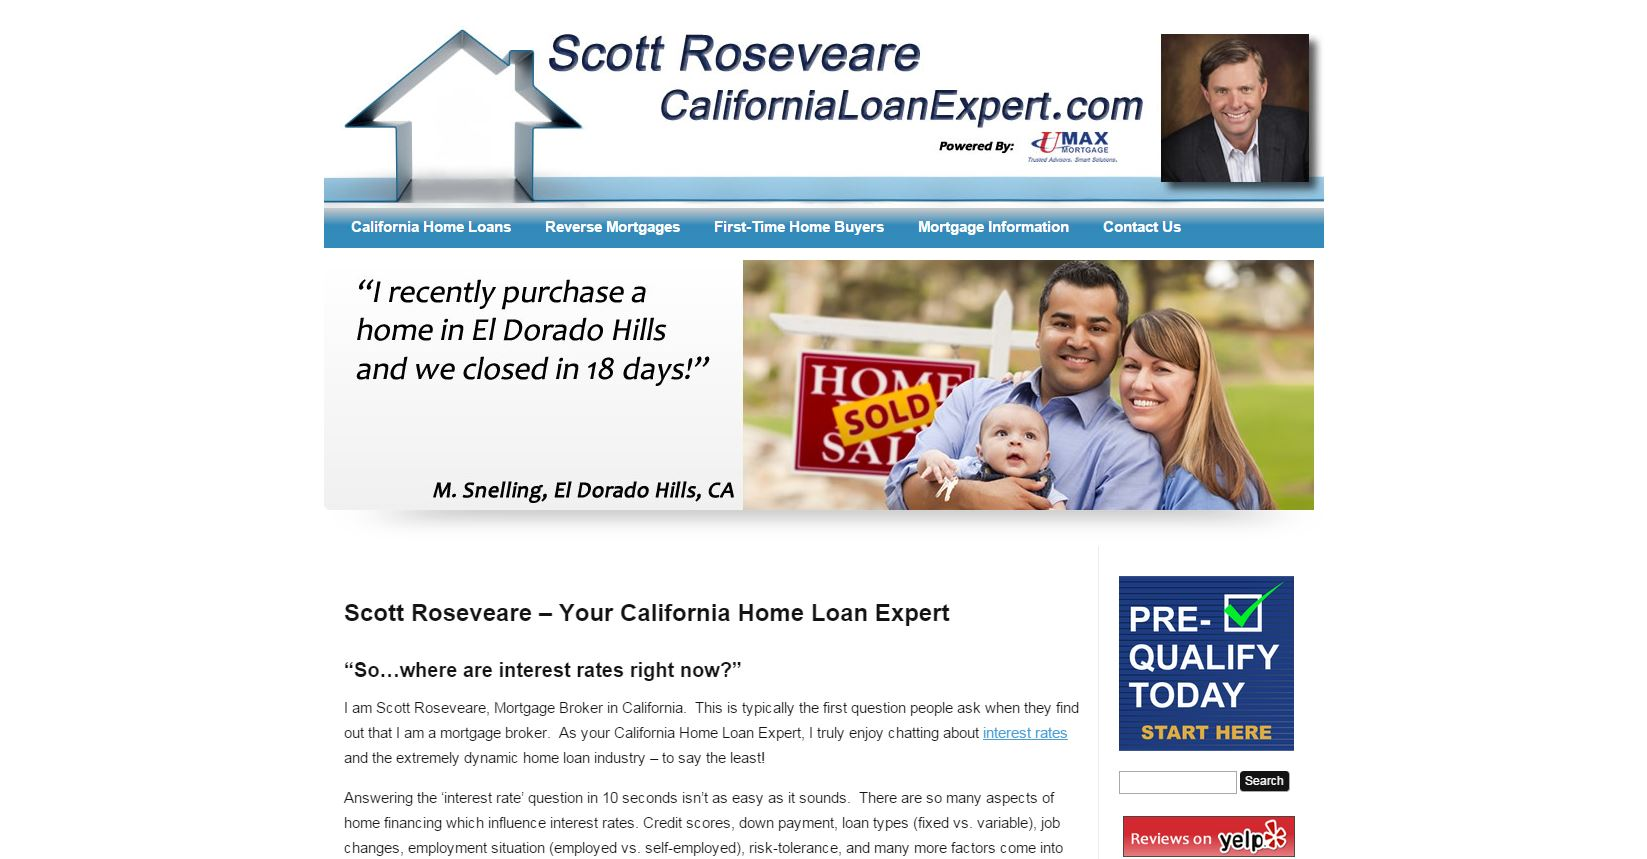 Screenshot of CaliforniaLoanExpert.com